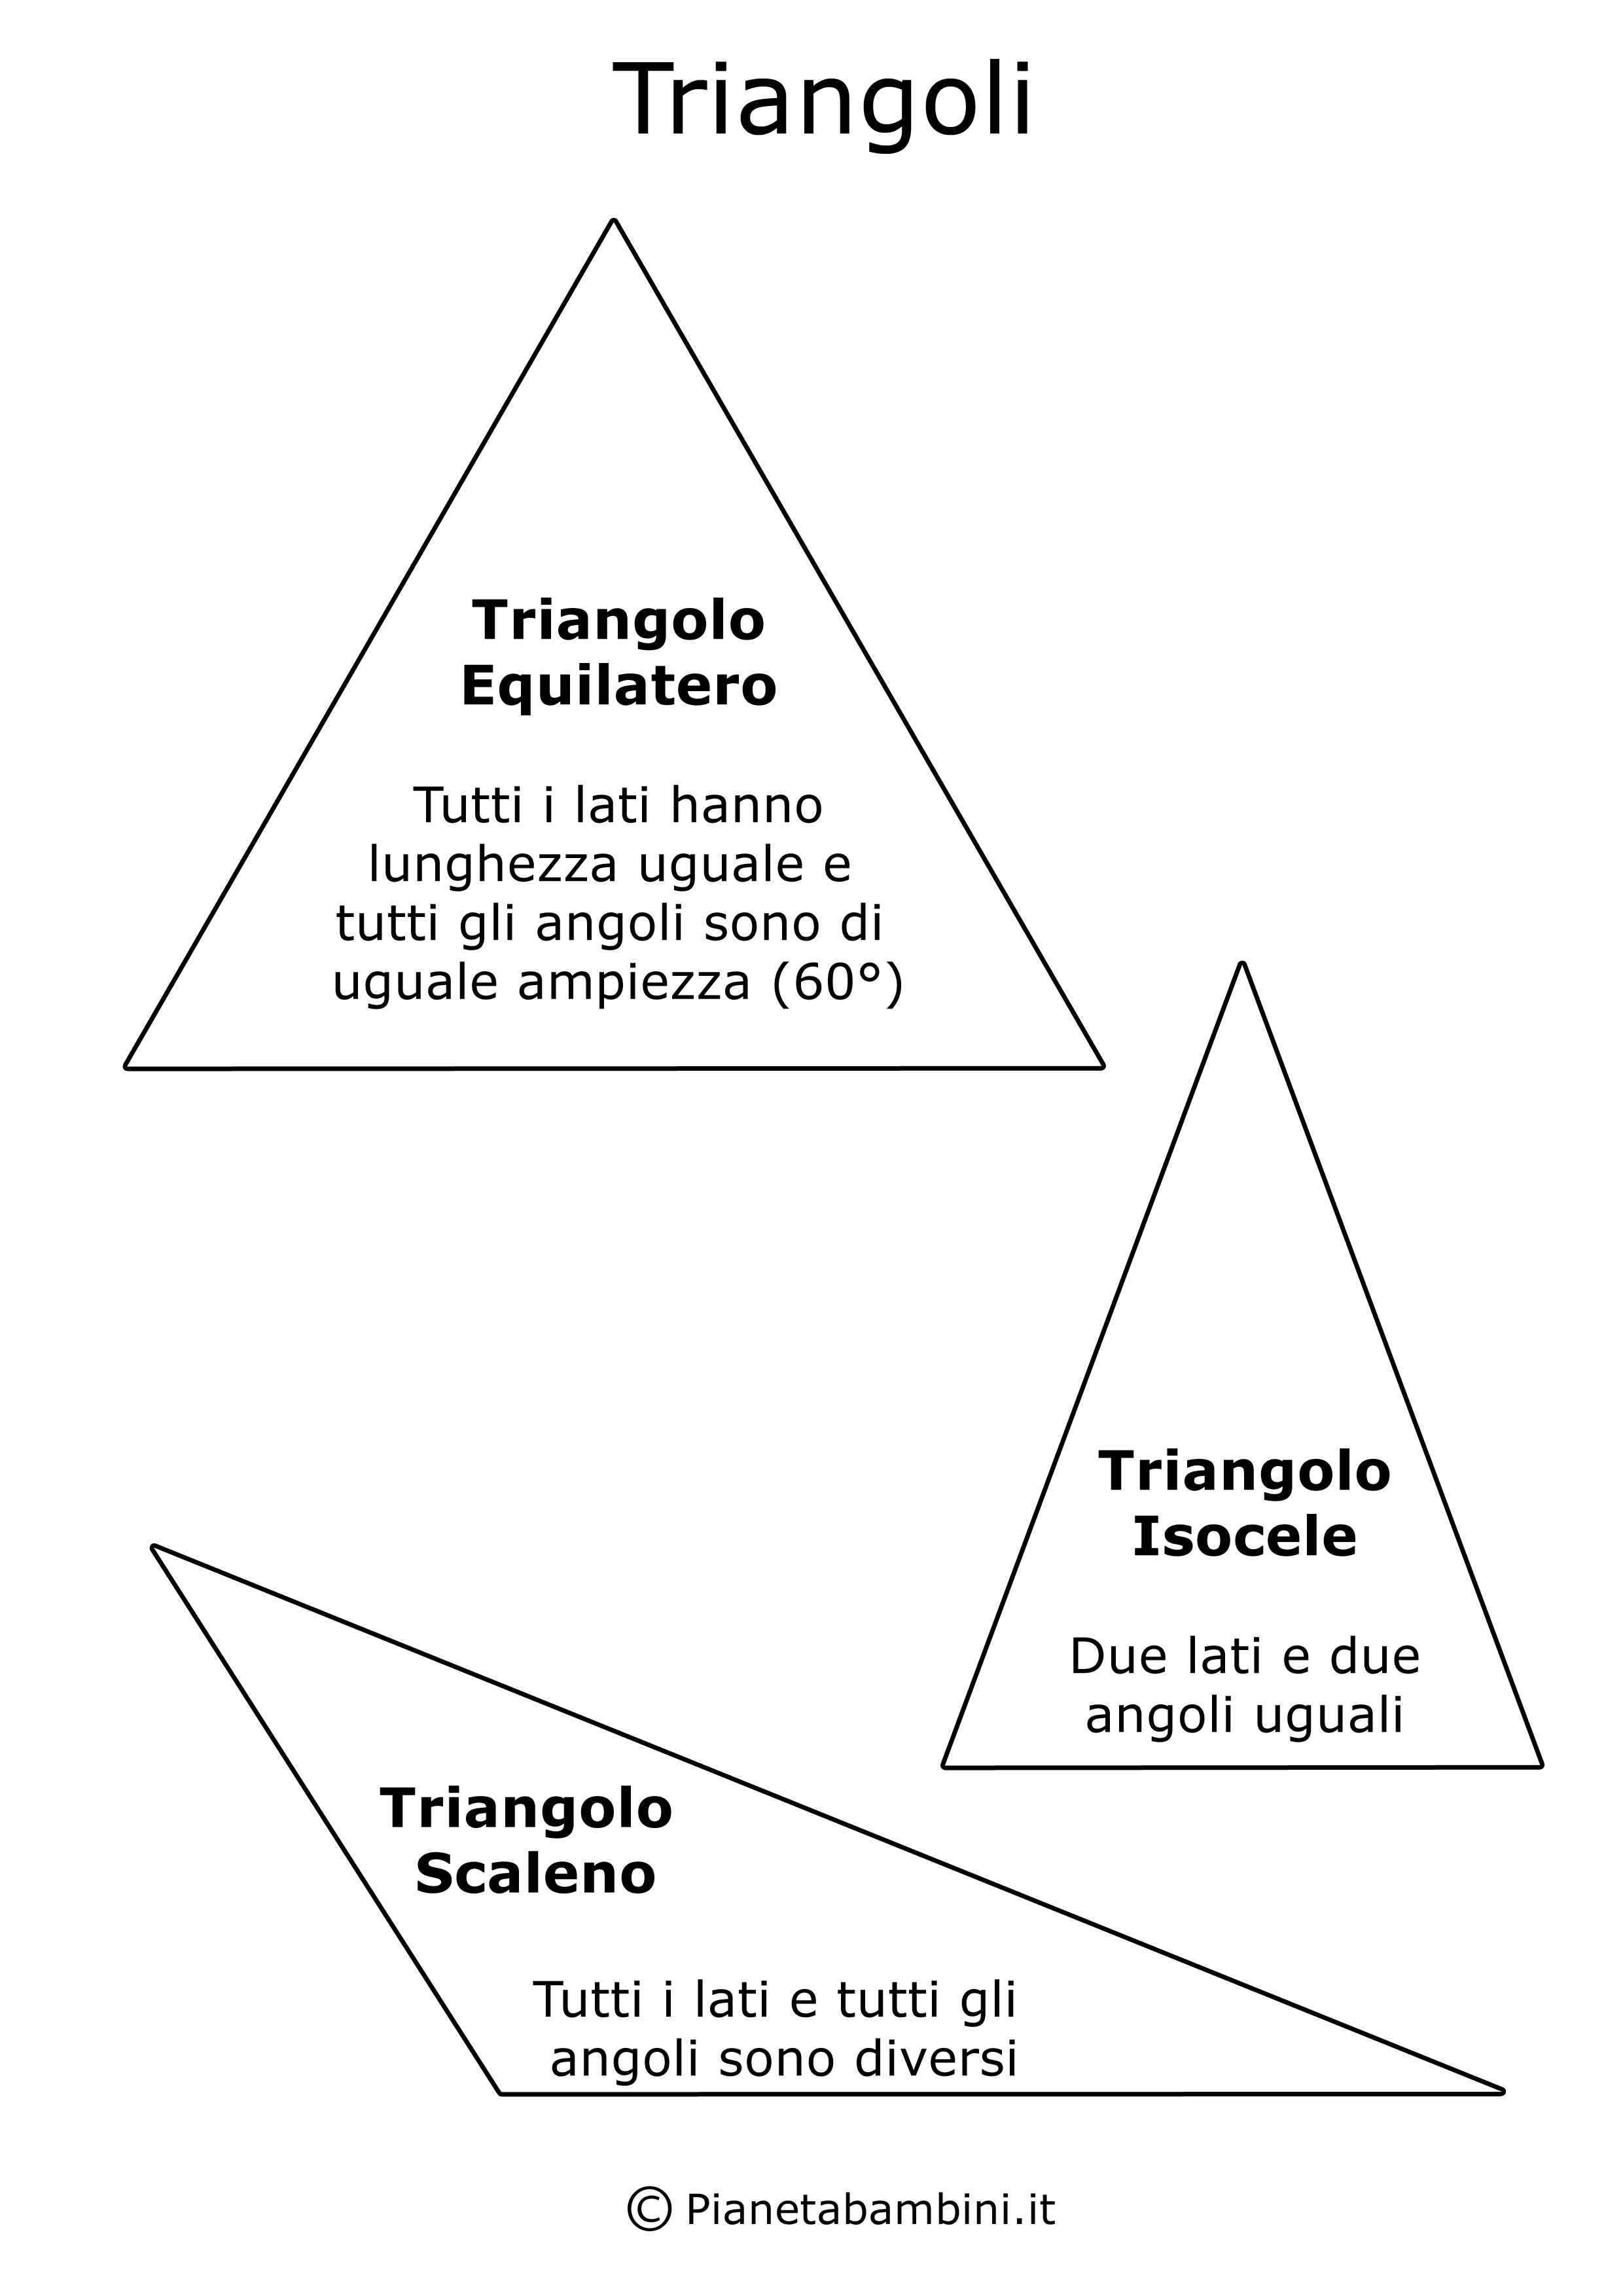 Triangoli-Bianco-Nero_1